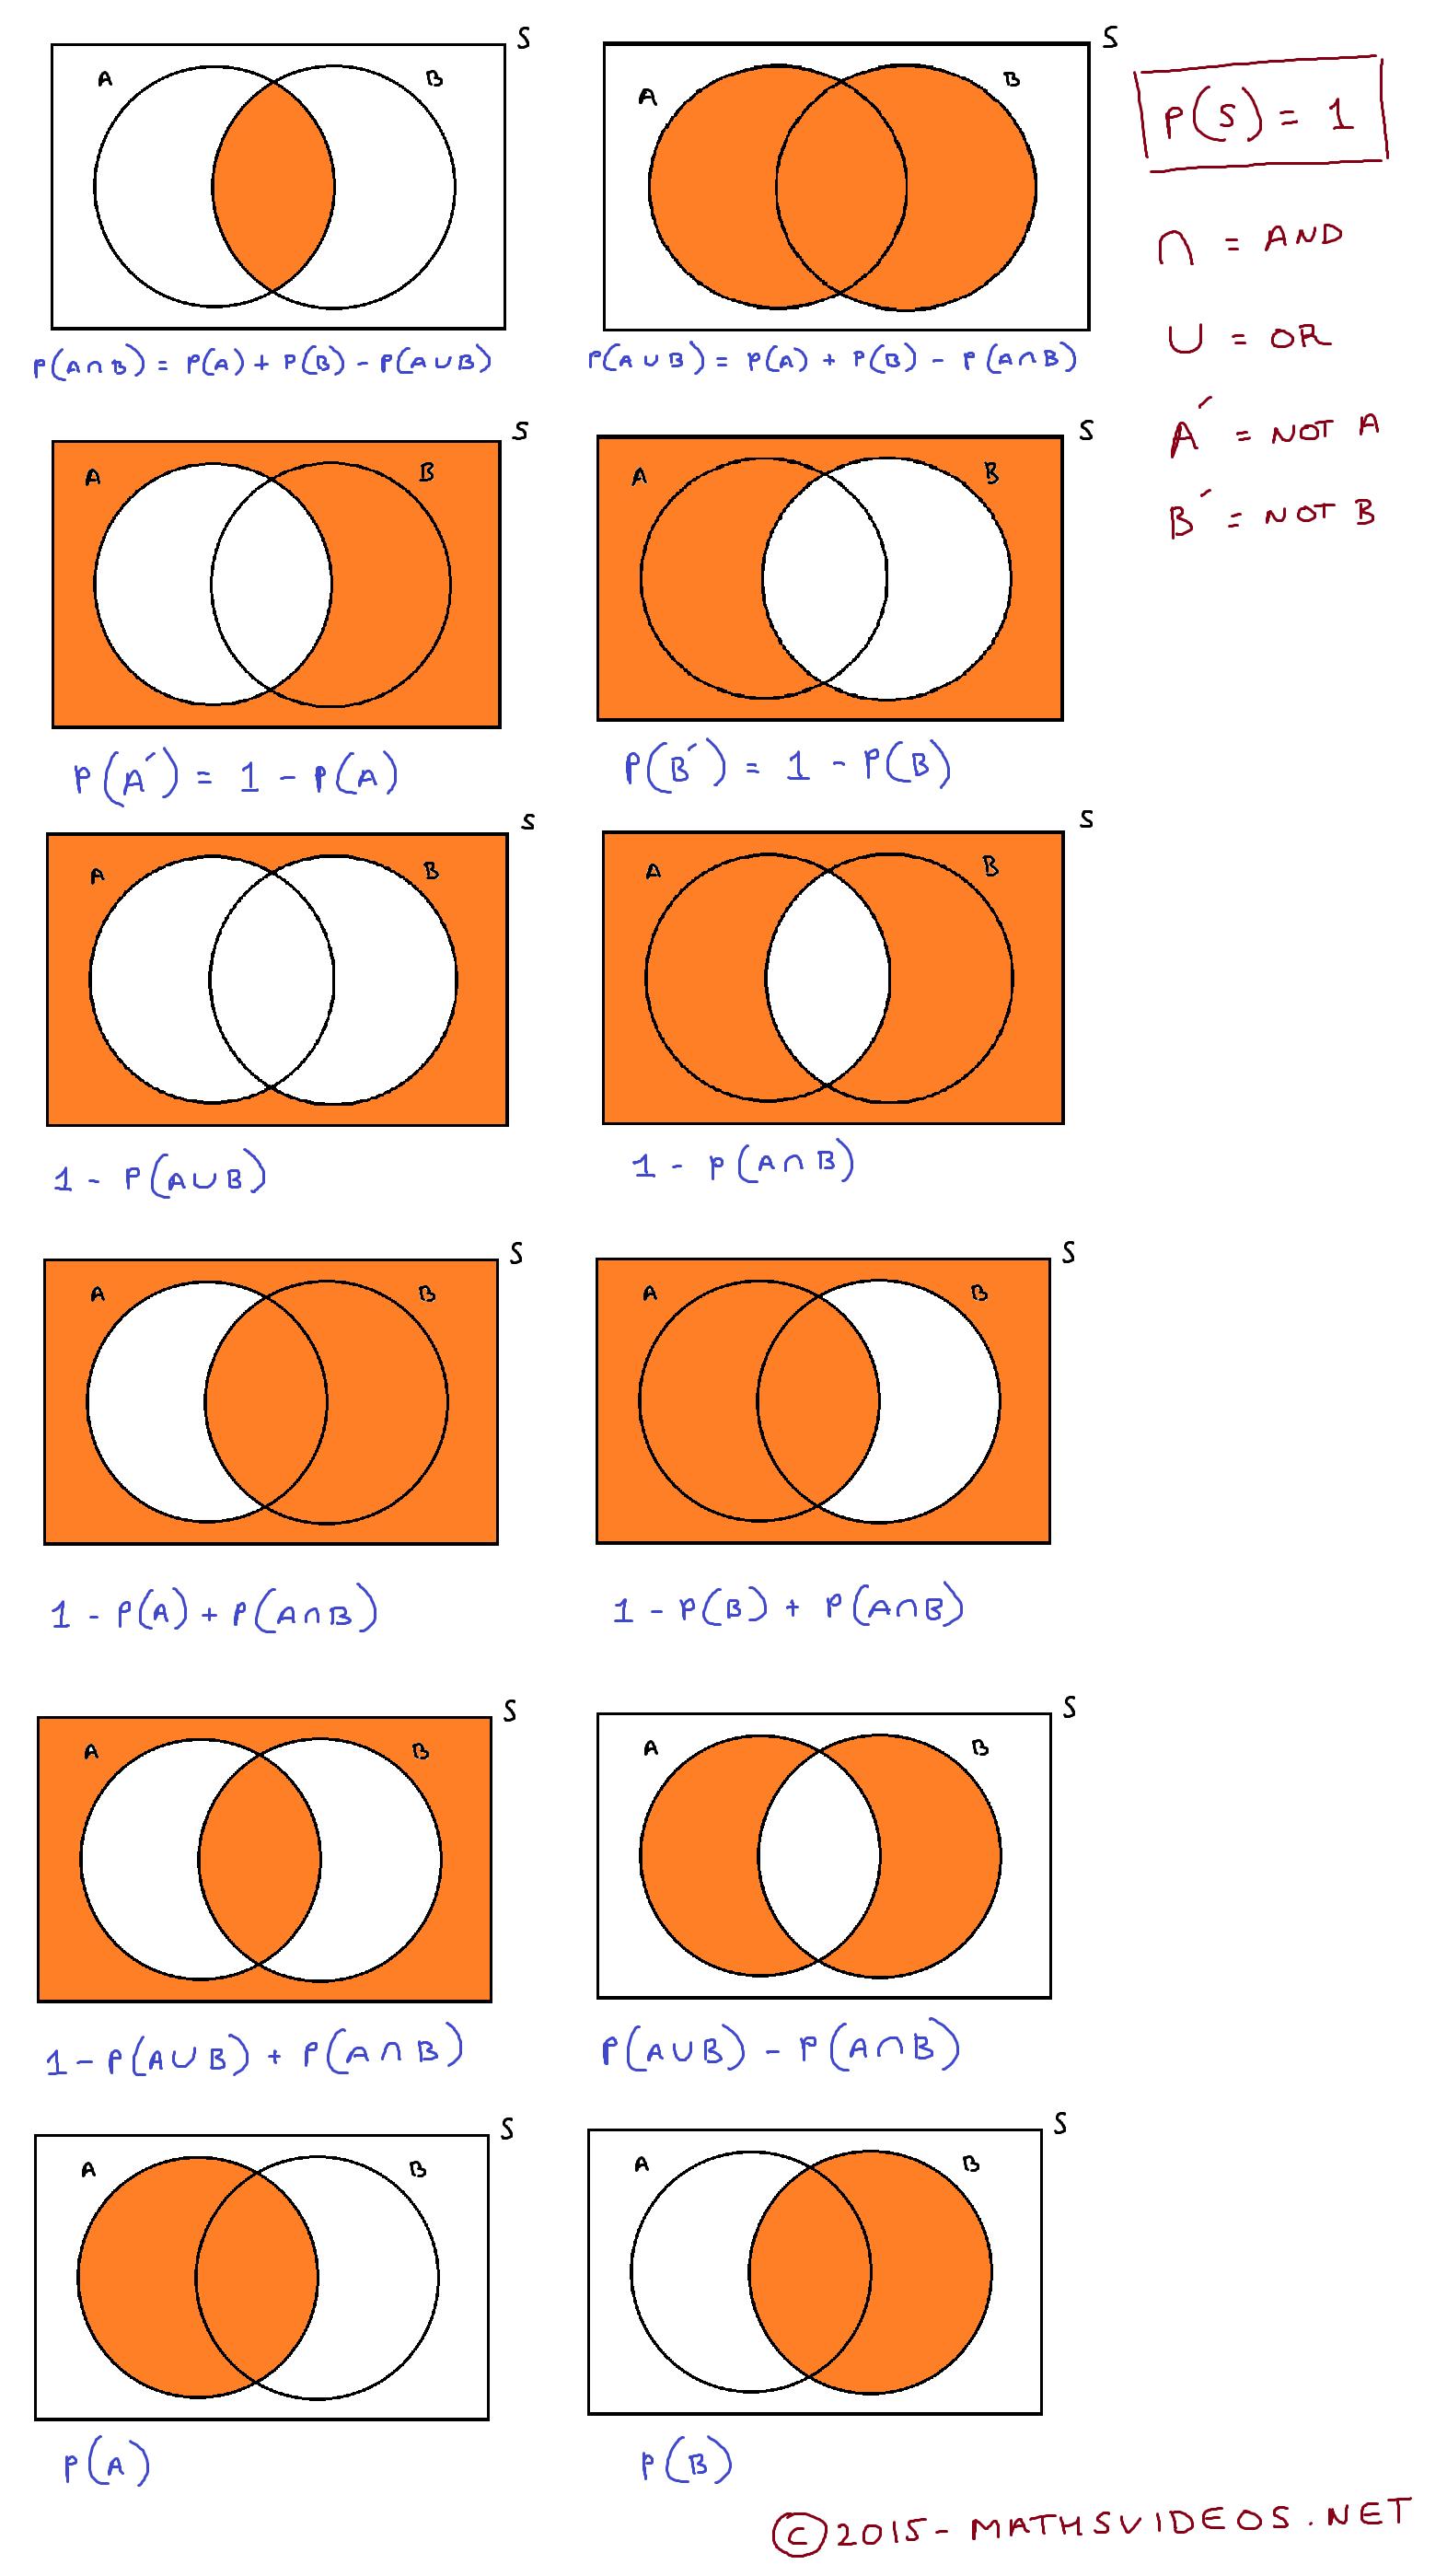 medium resolution of comprehensive list of venn diagrams and probabilistic formulascomprehensive list of venn diagrams and probabilistic formulas